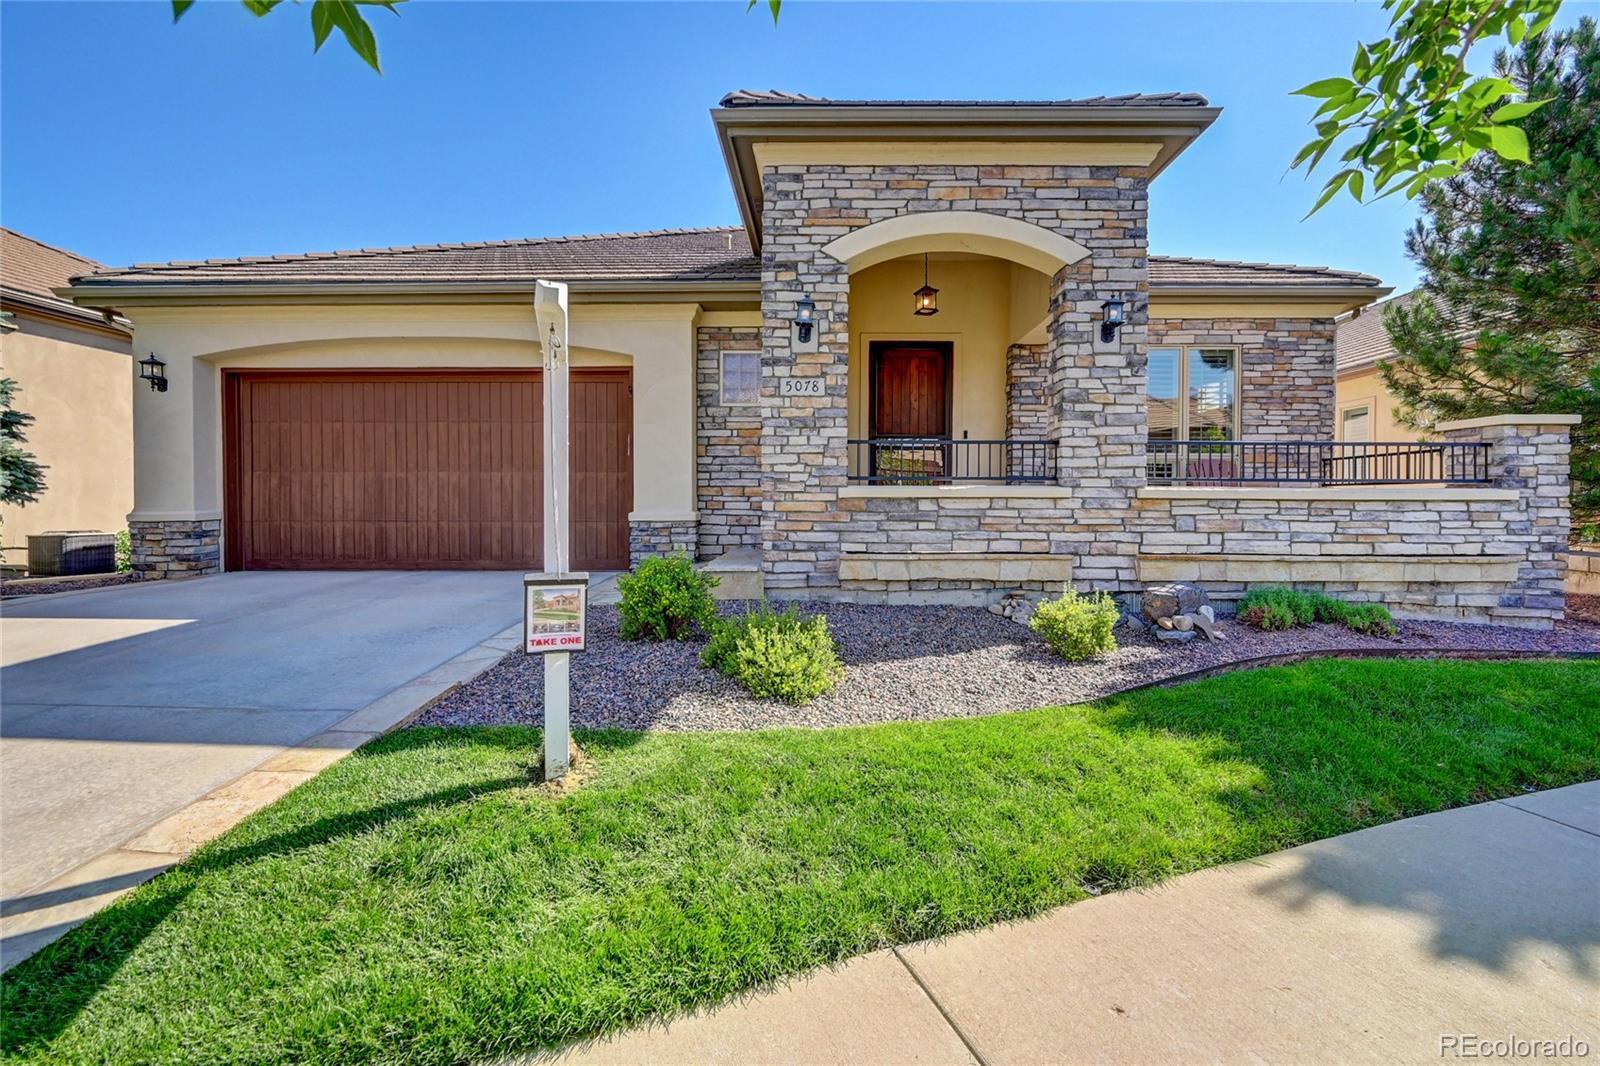 5078 S Allison Way Property Photo - Littleton, CO real estate listing